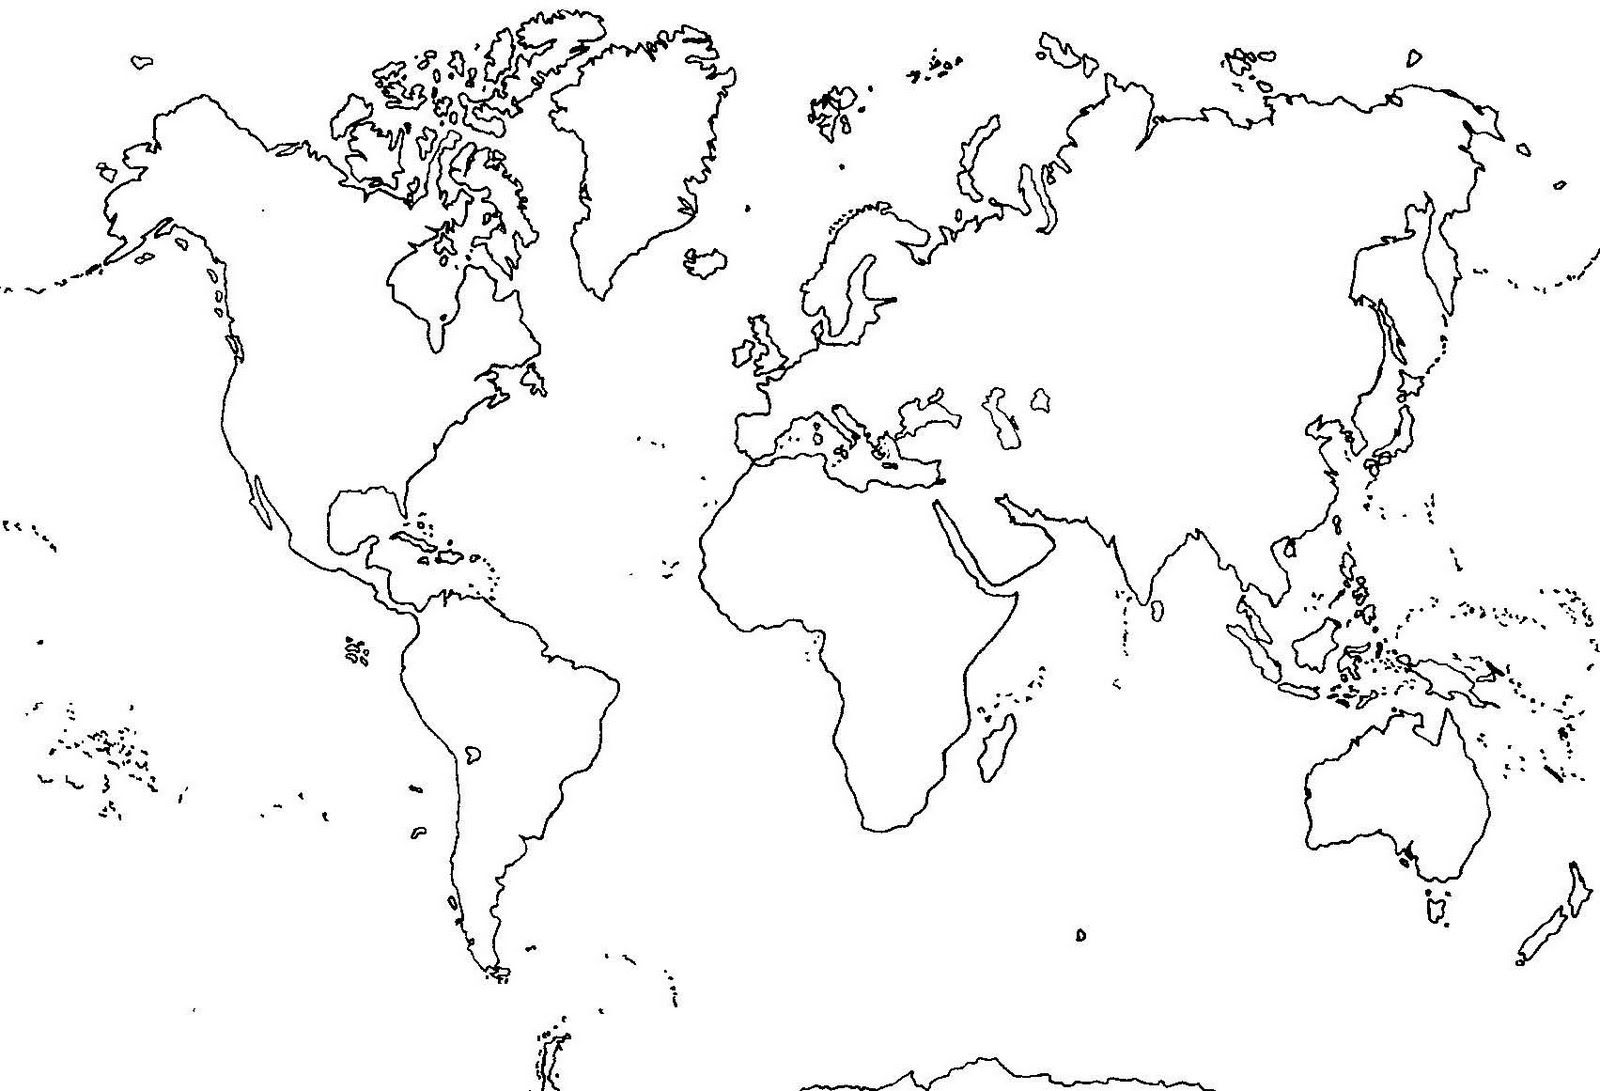 Mapa Del Mundo Mudo.Mapas Mudos Gratis Mapas Mudos De Continentes Mapamundi